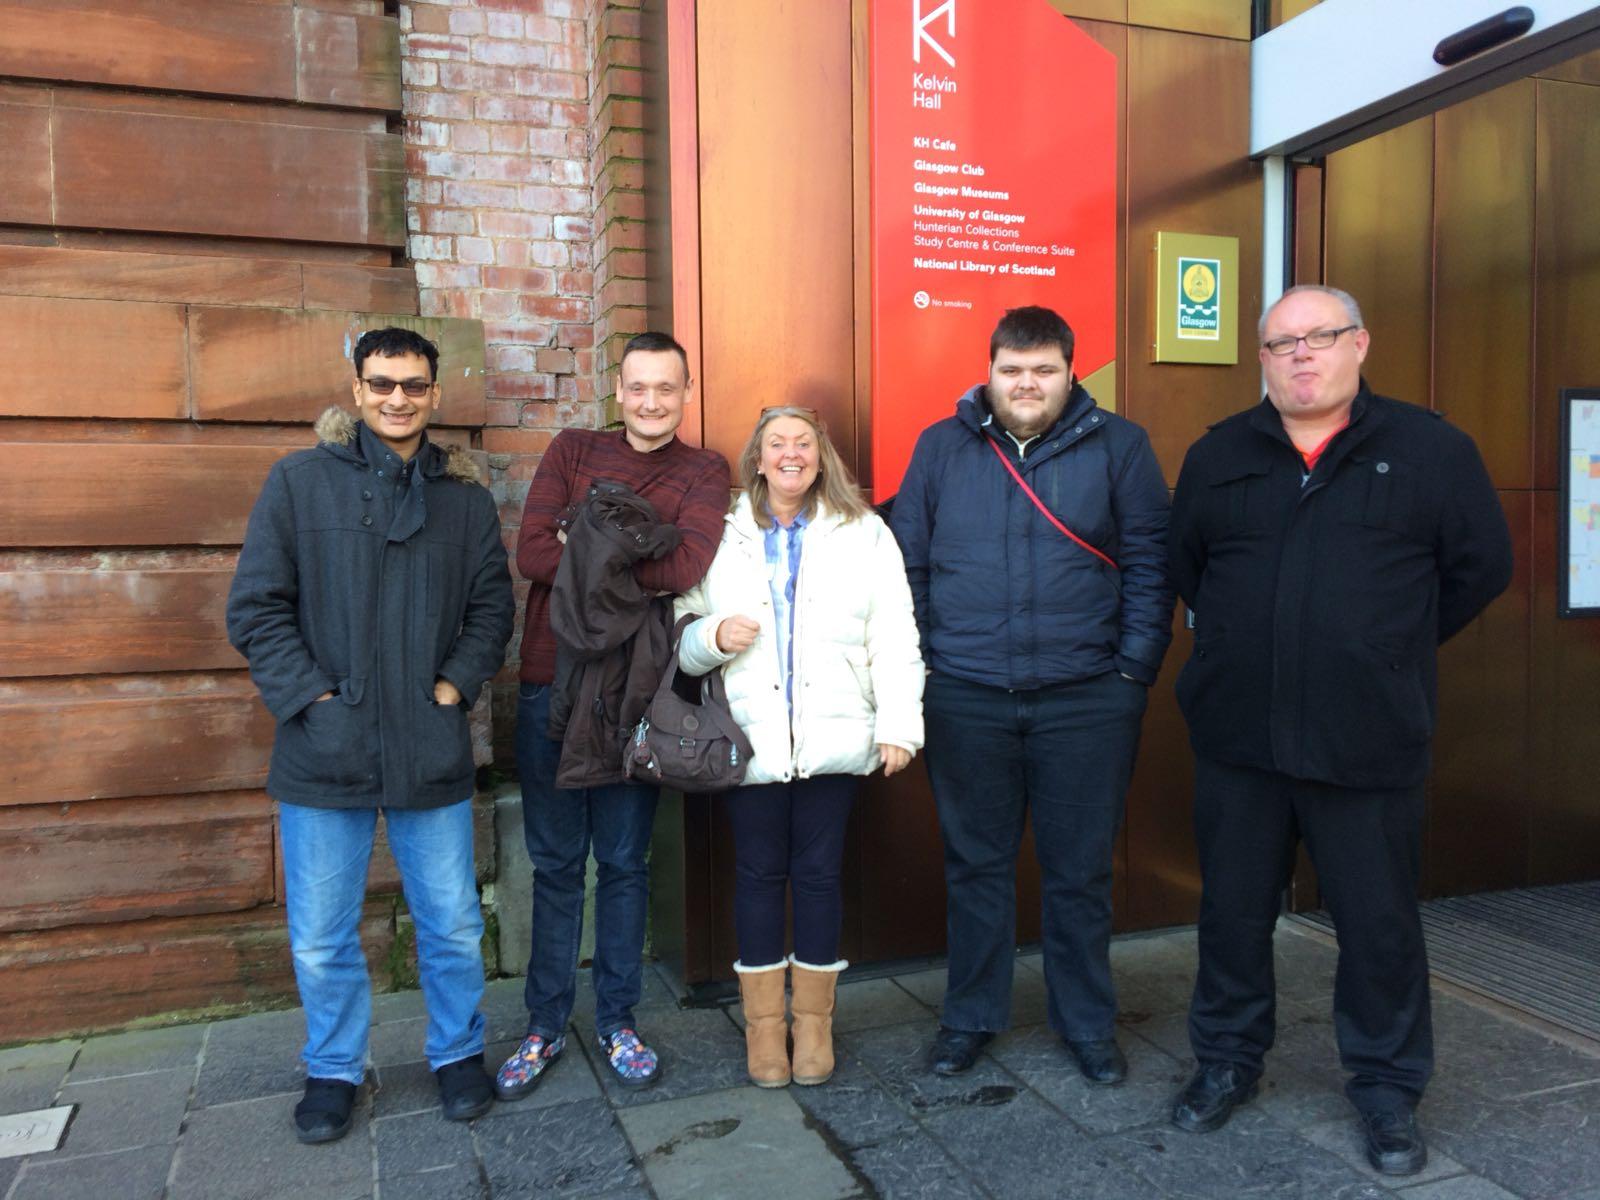 Group 1 at Kelvinhall